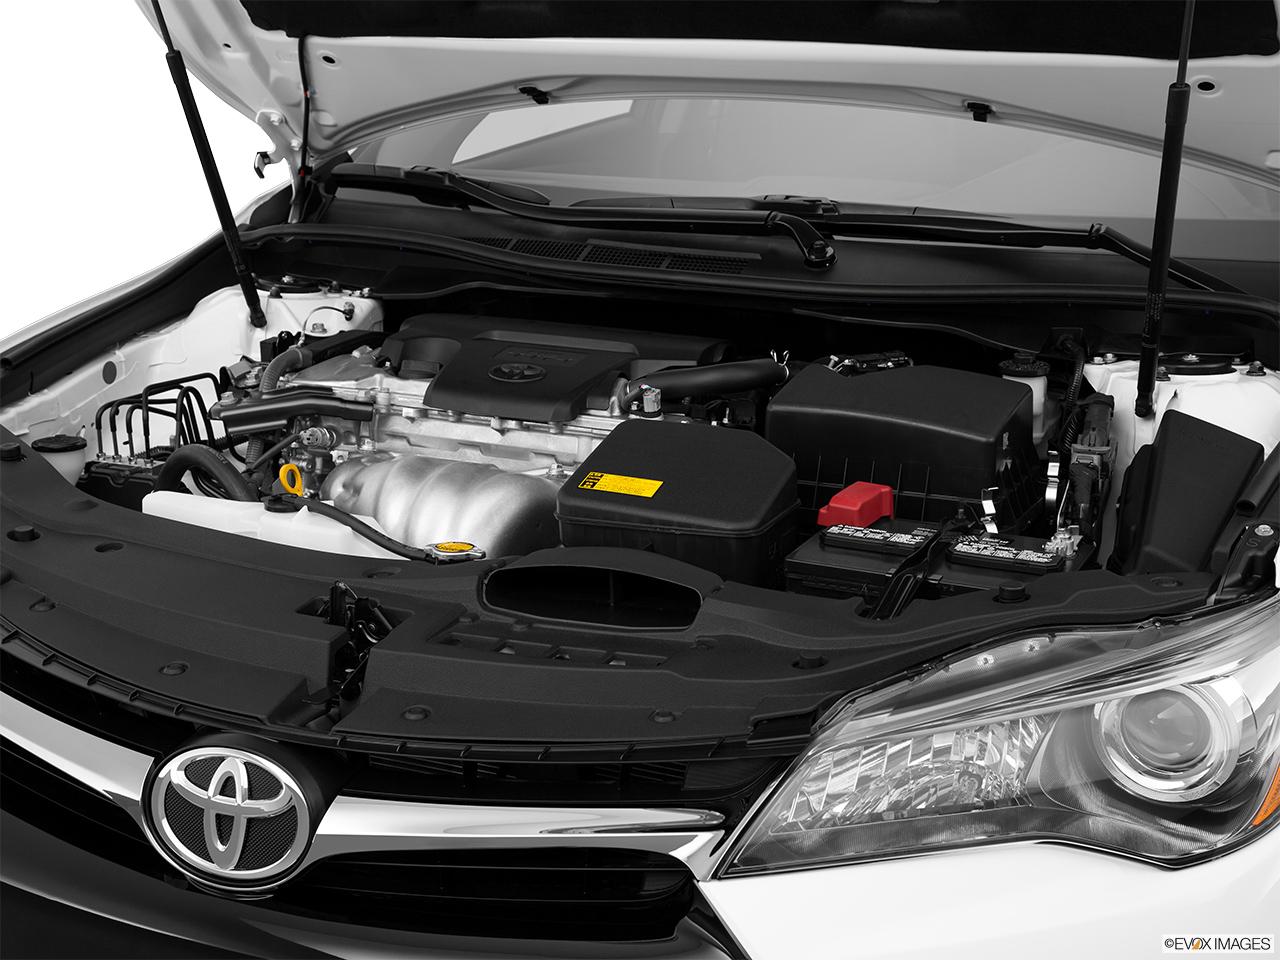 2015 Toyota Camry Hybrid 4dr Sedan SE - Engine